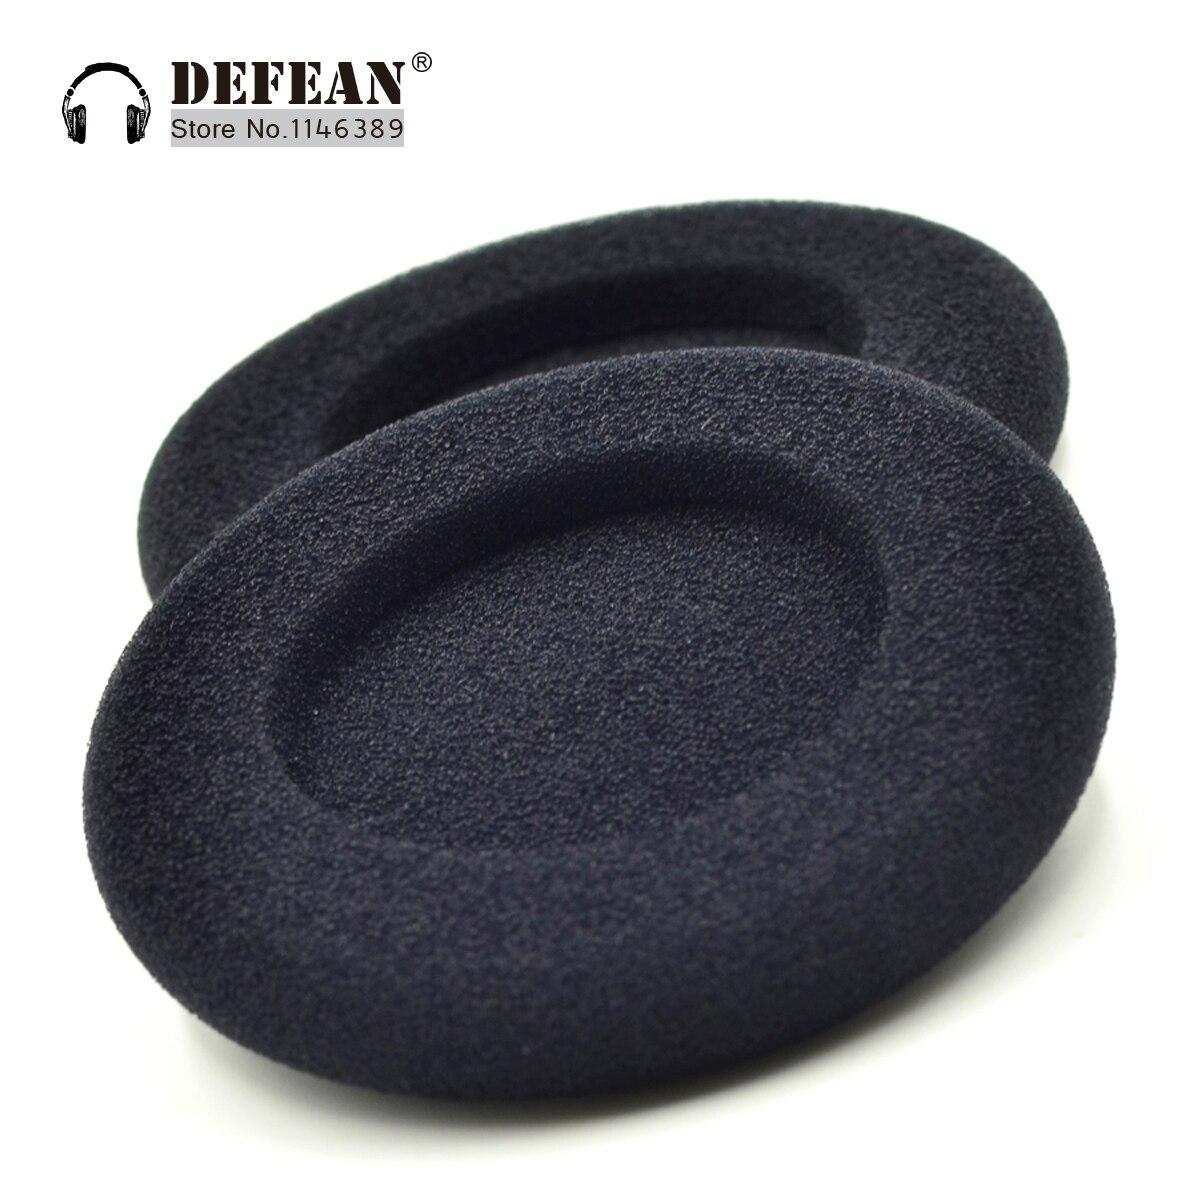 New Foam Ear pads cushion earpads for SONY MDR 301 301LP Headphones Headset